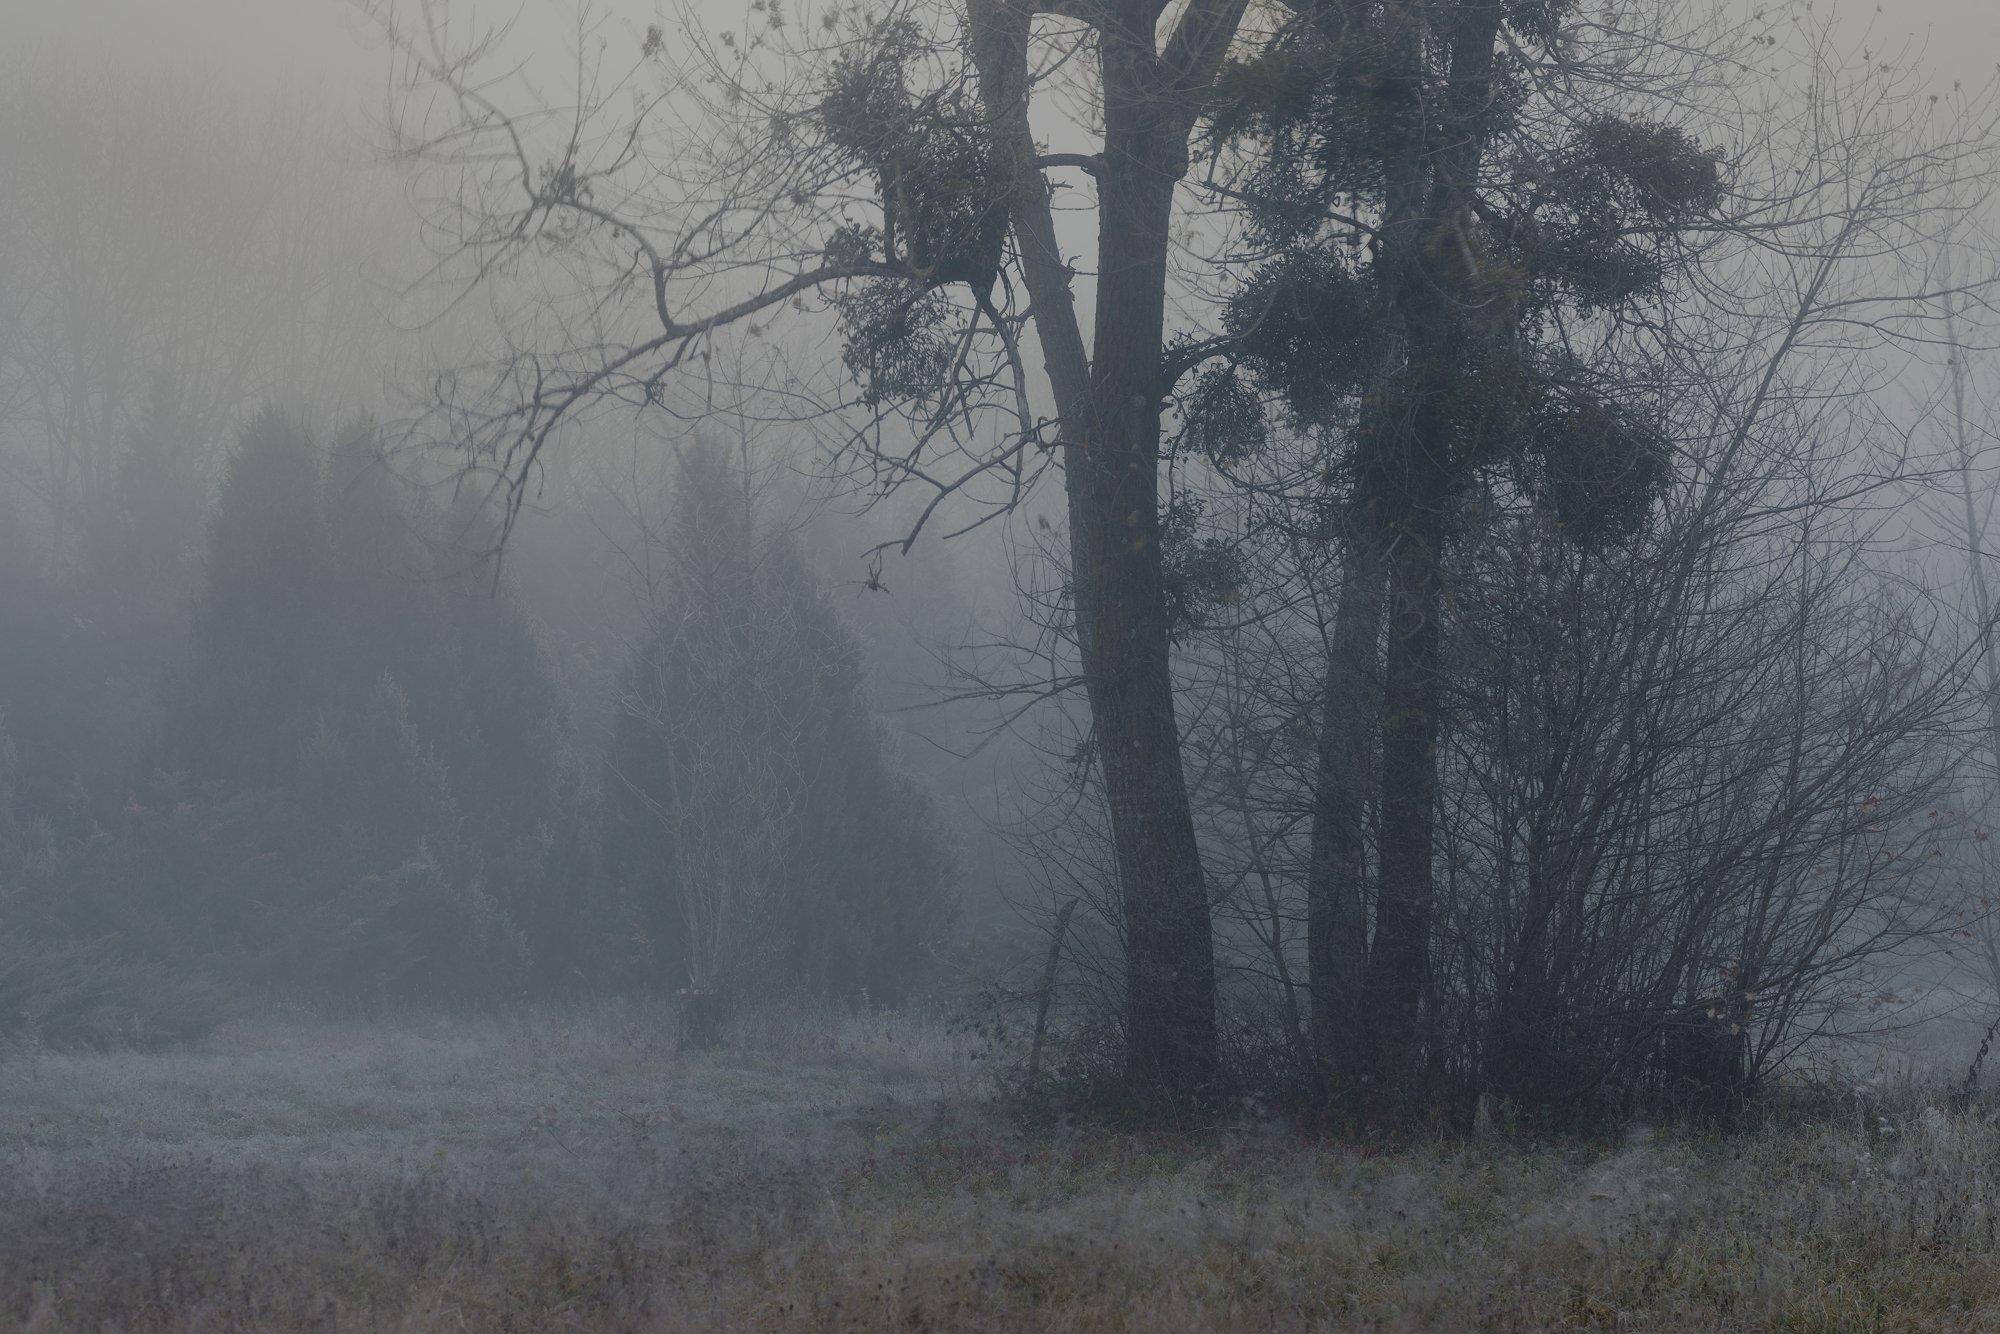 осень рассвет лес листва туман, Александр Жарников